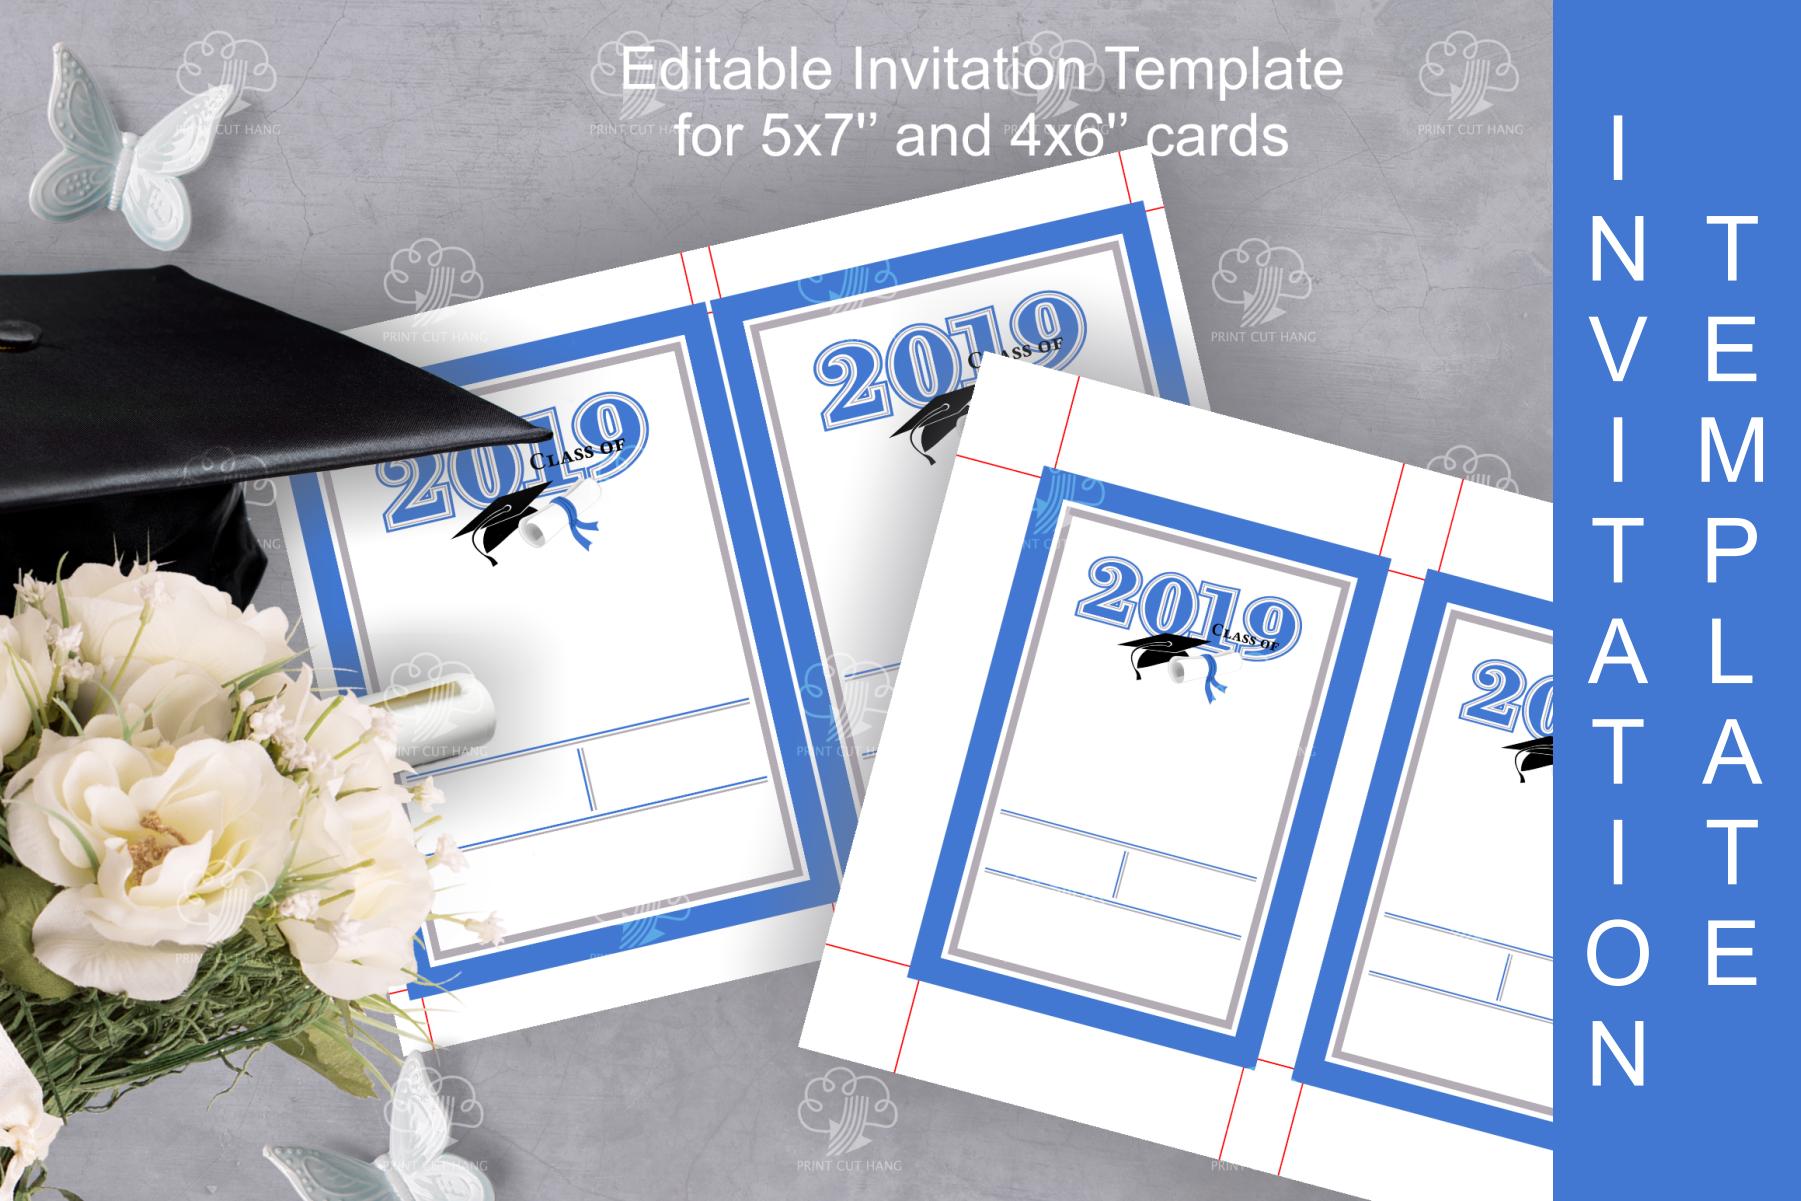 Invitation Template editable text - BLUE - Graduation 2019 example image 3